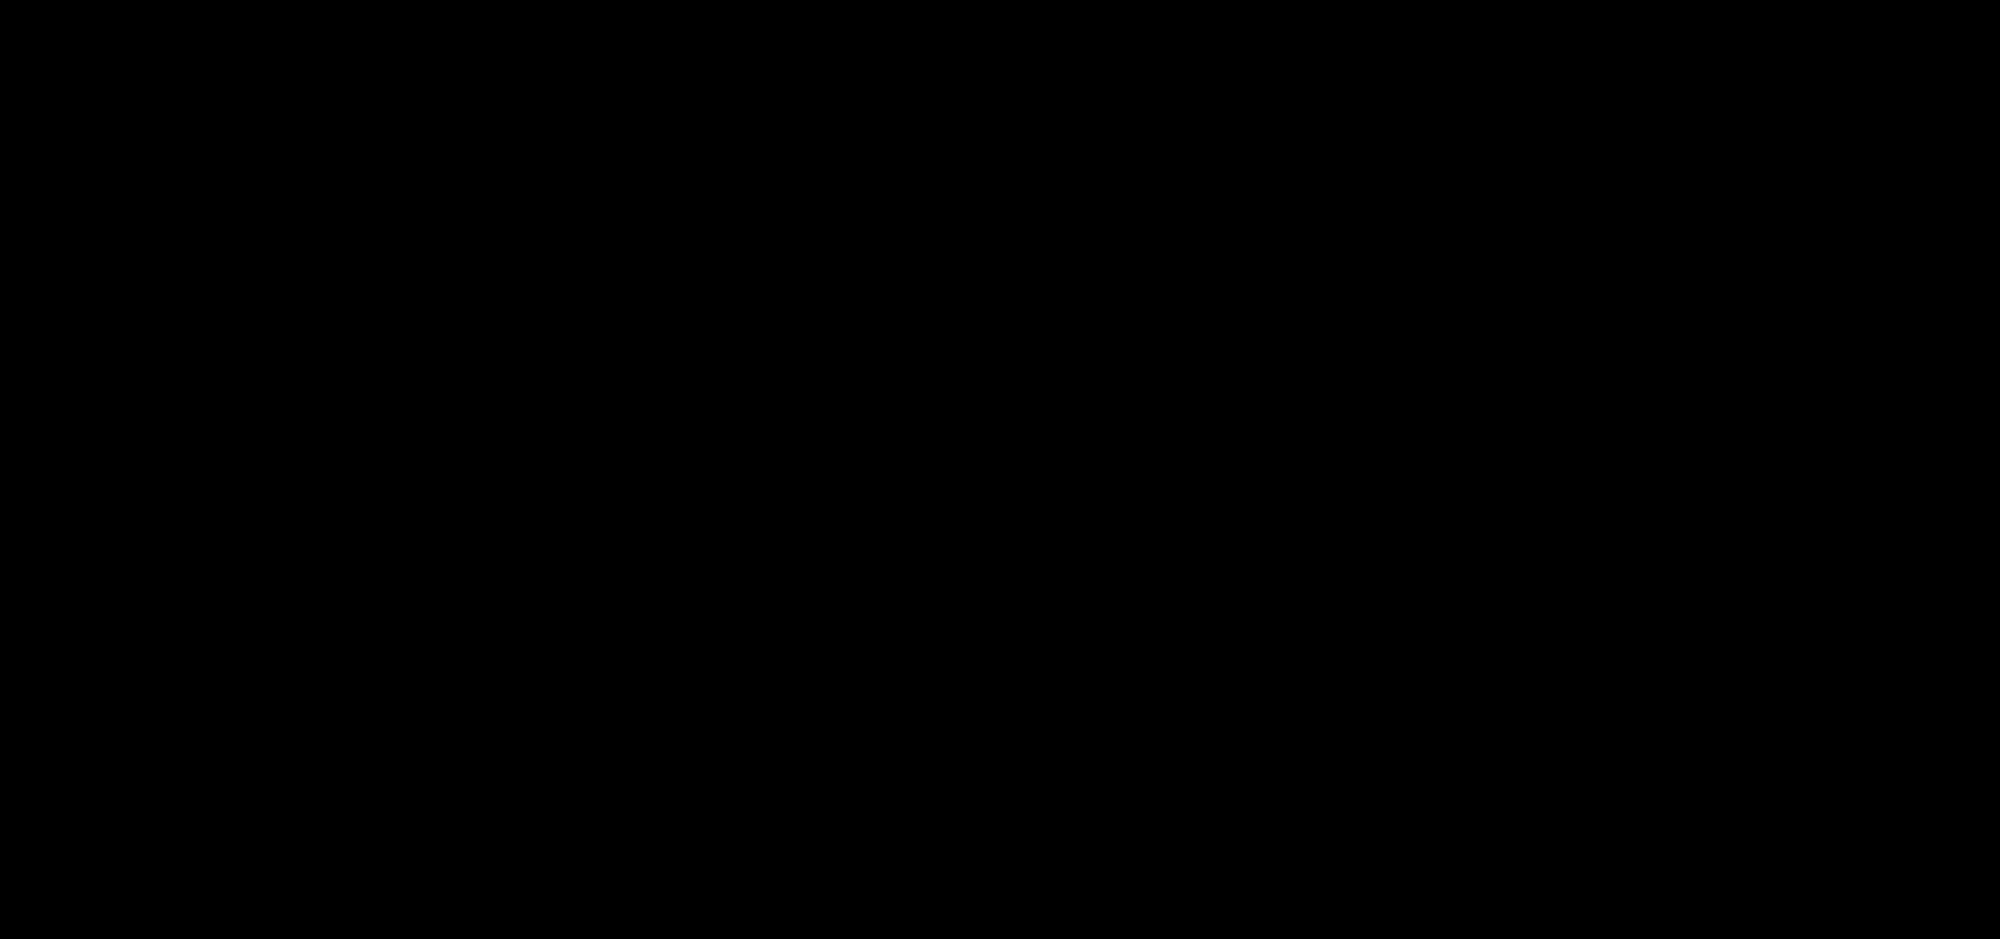 2000x939 15 Fallout 4 Png Logo For Free Download On Mbtskoudsalg